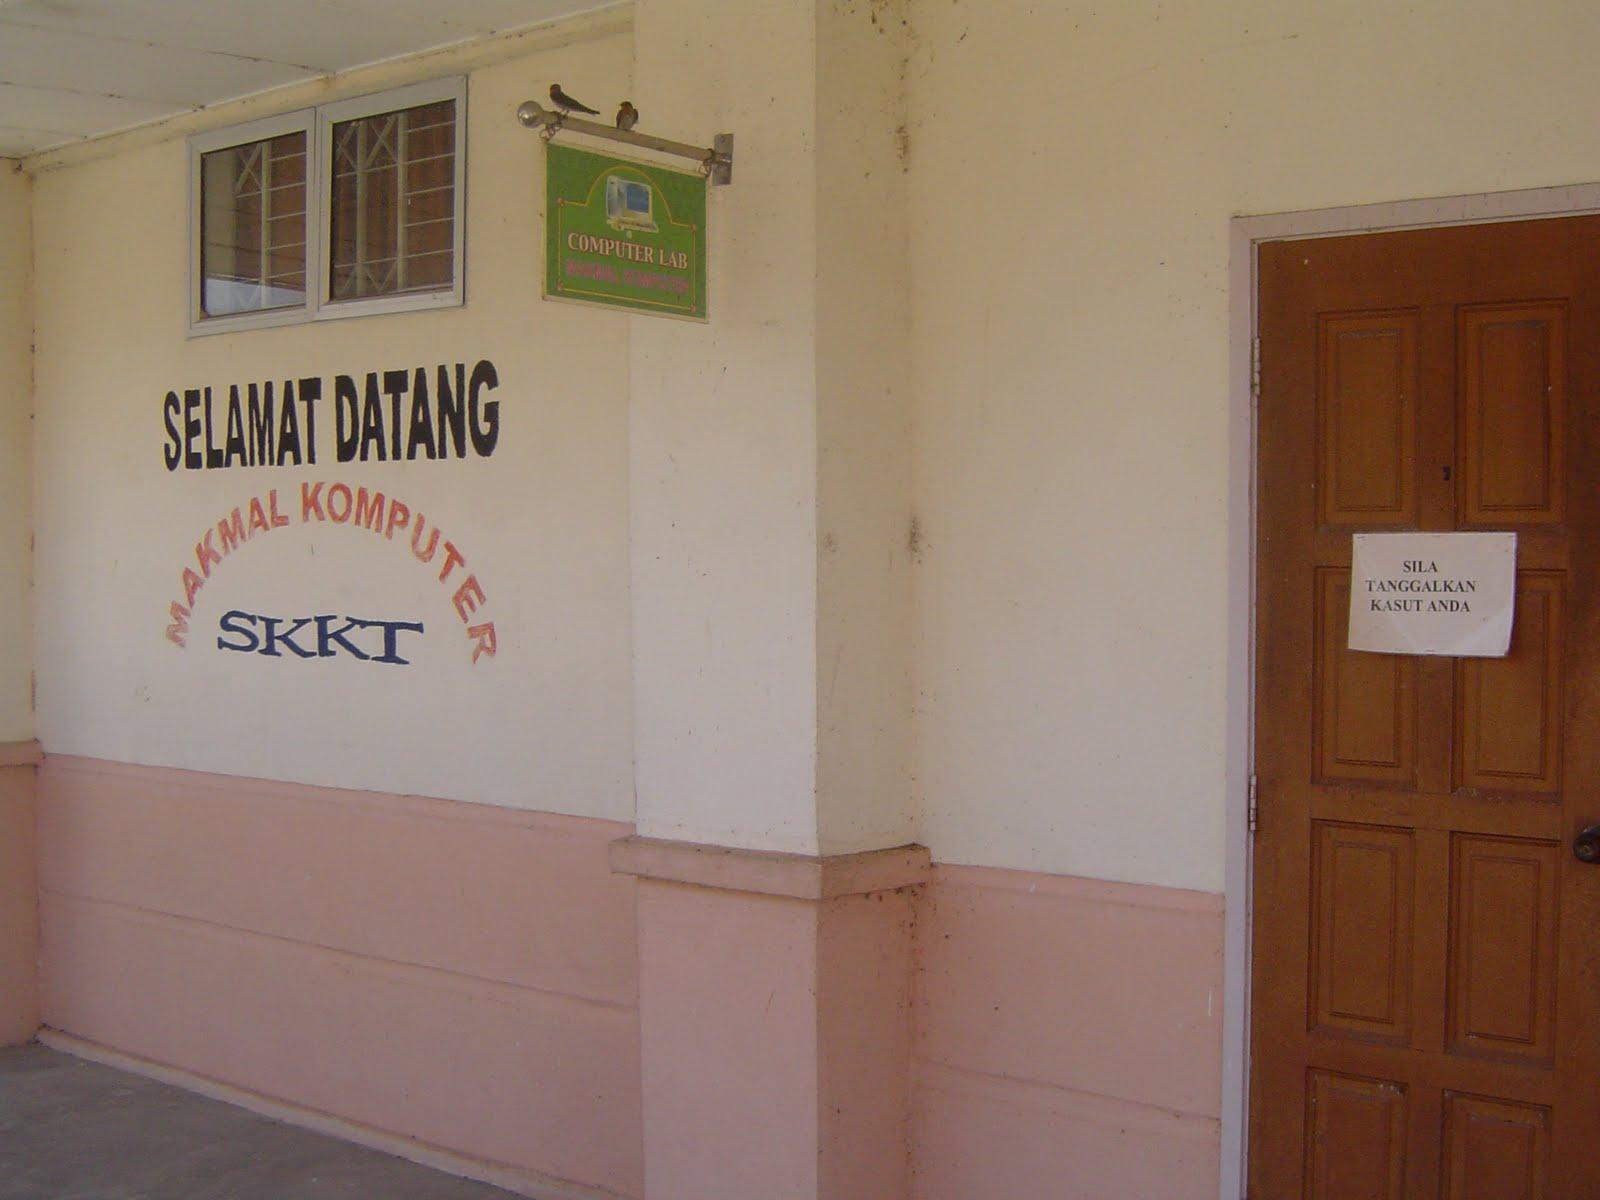 SK Kampong Tua: Makmal Komputer